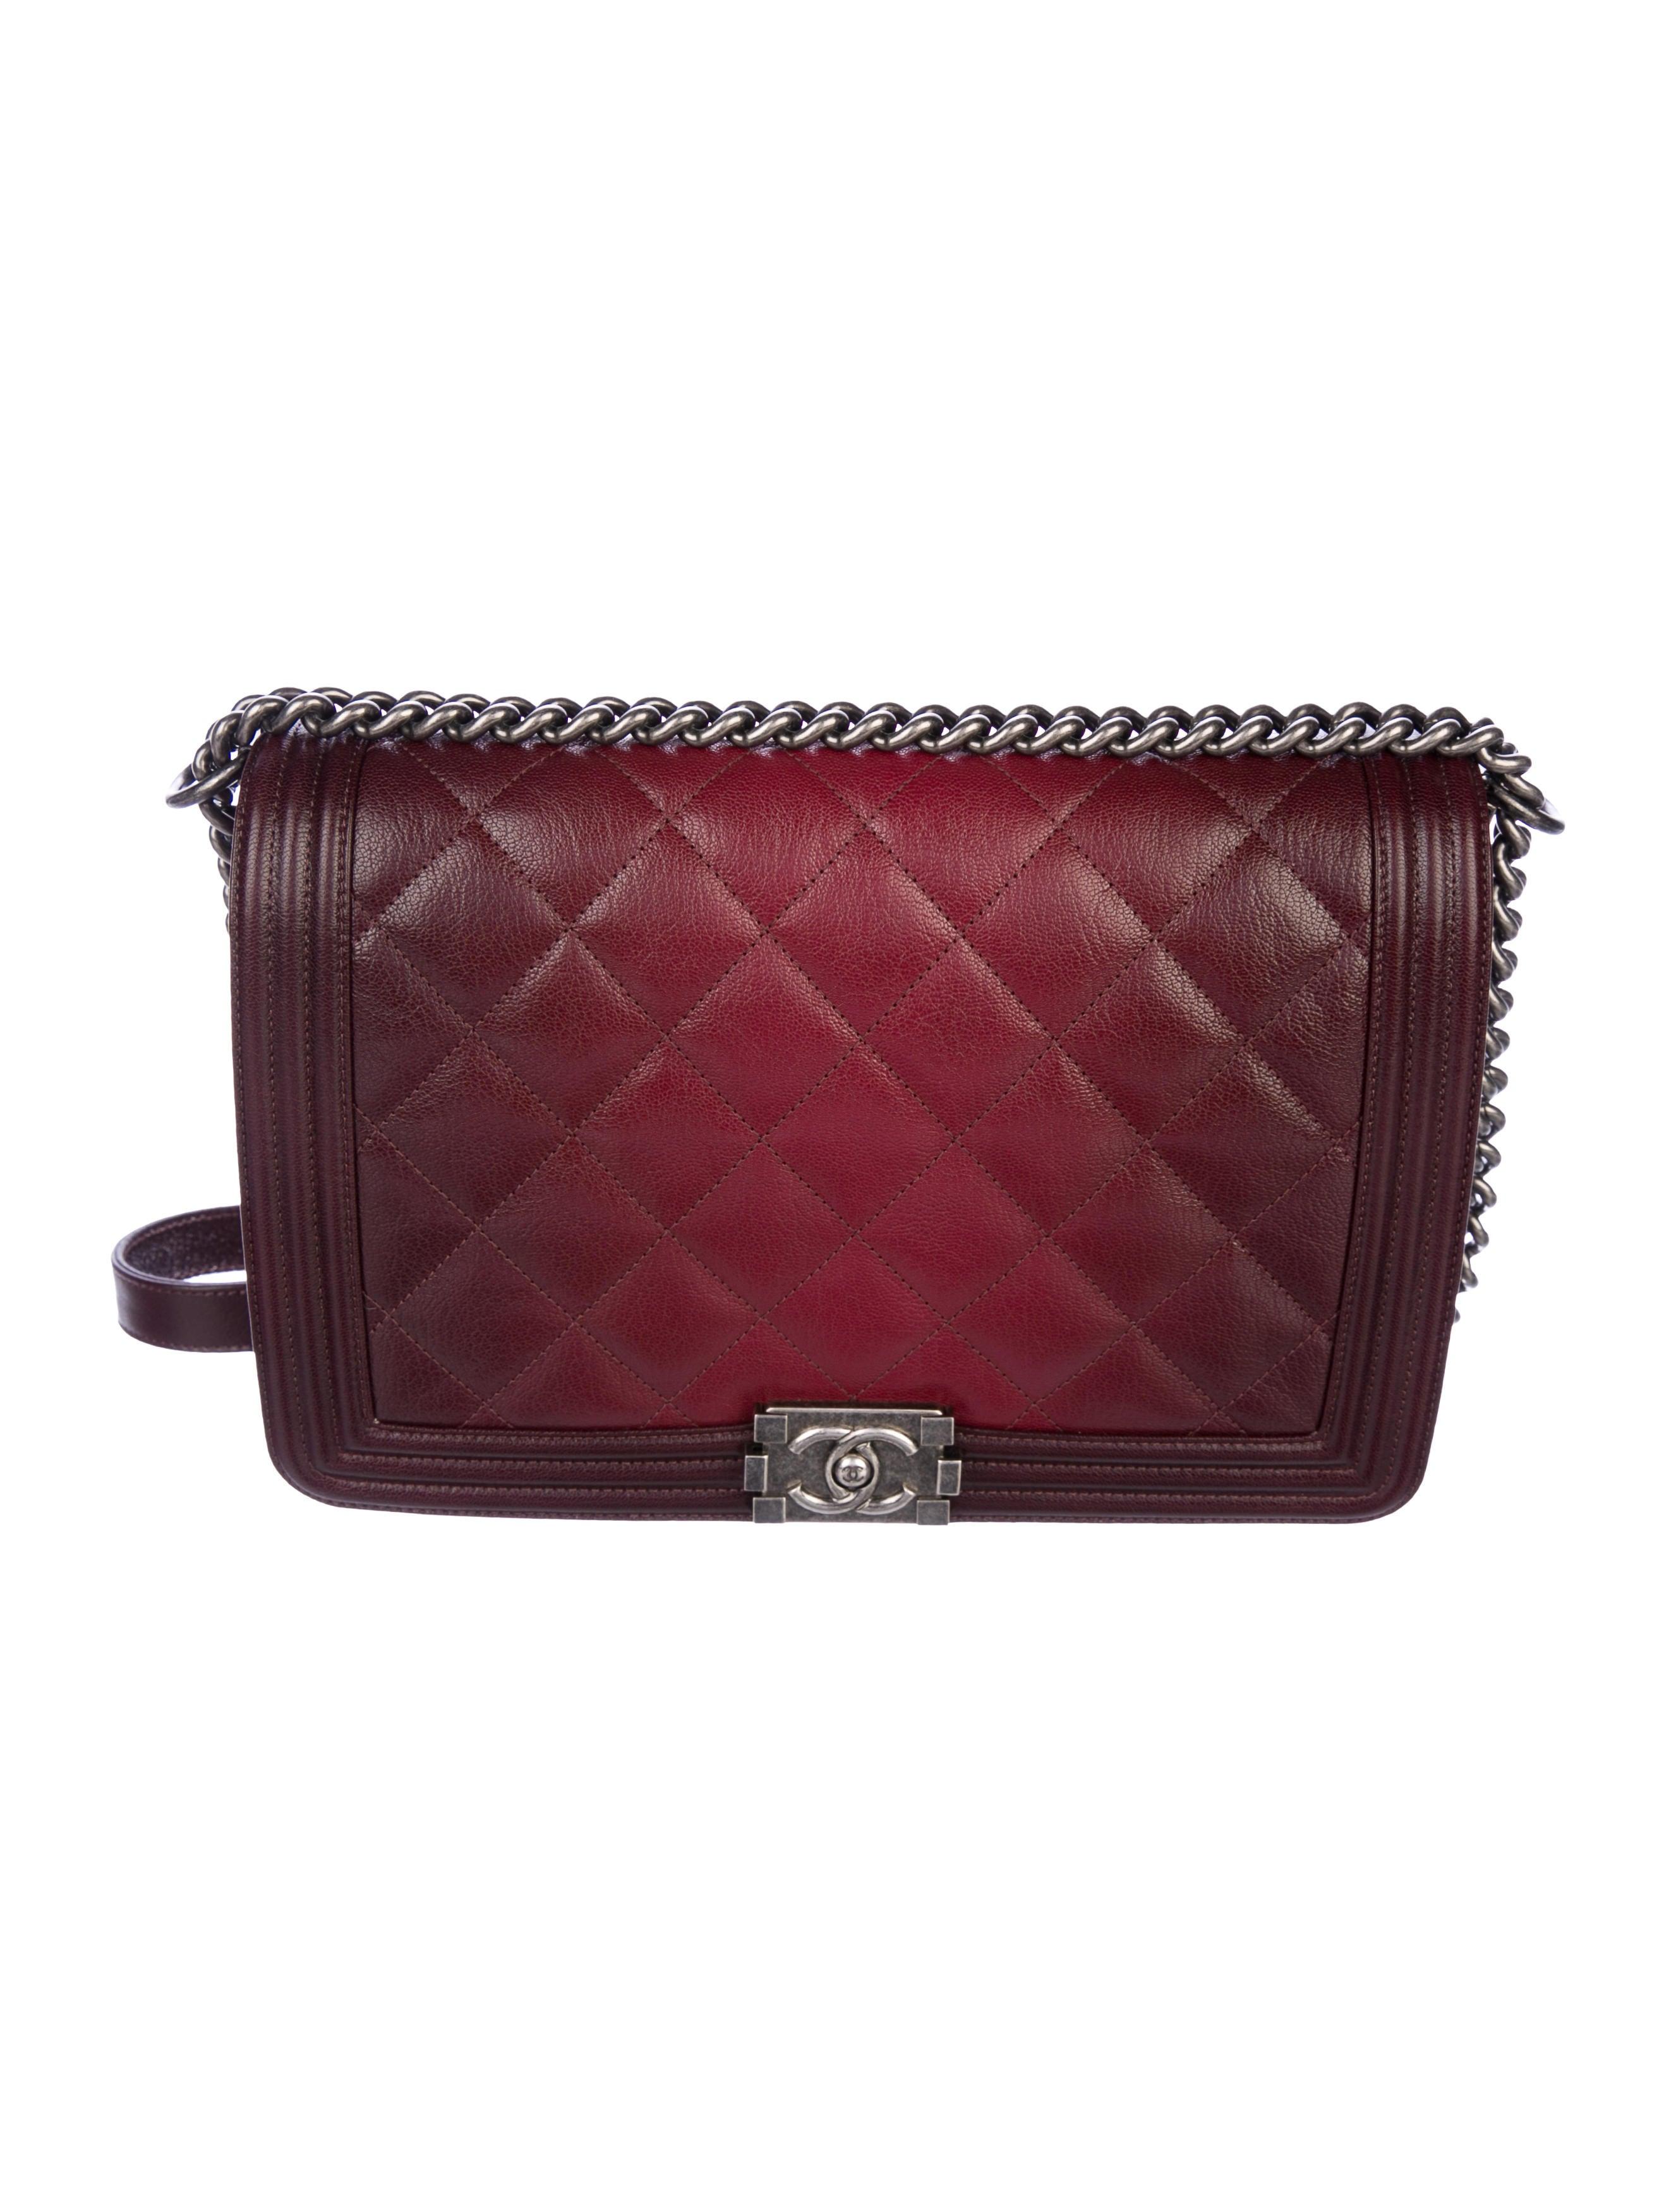 97c7f0054da375 Chanel Medium Plus Cube Boy Bag - Handbags - CHA323850 | The RealReal